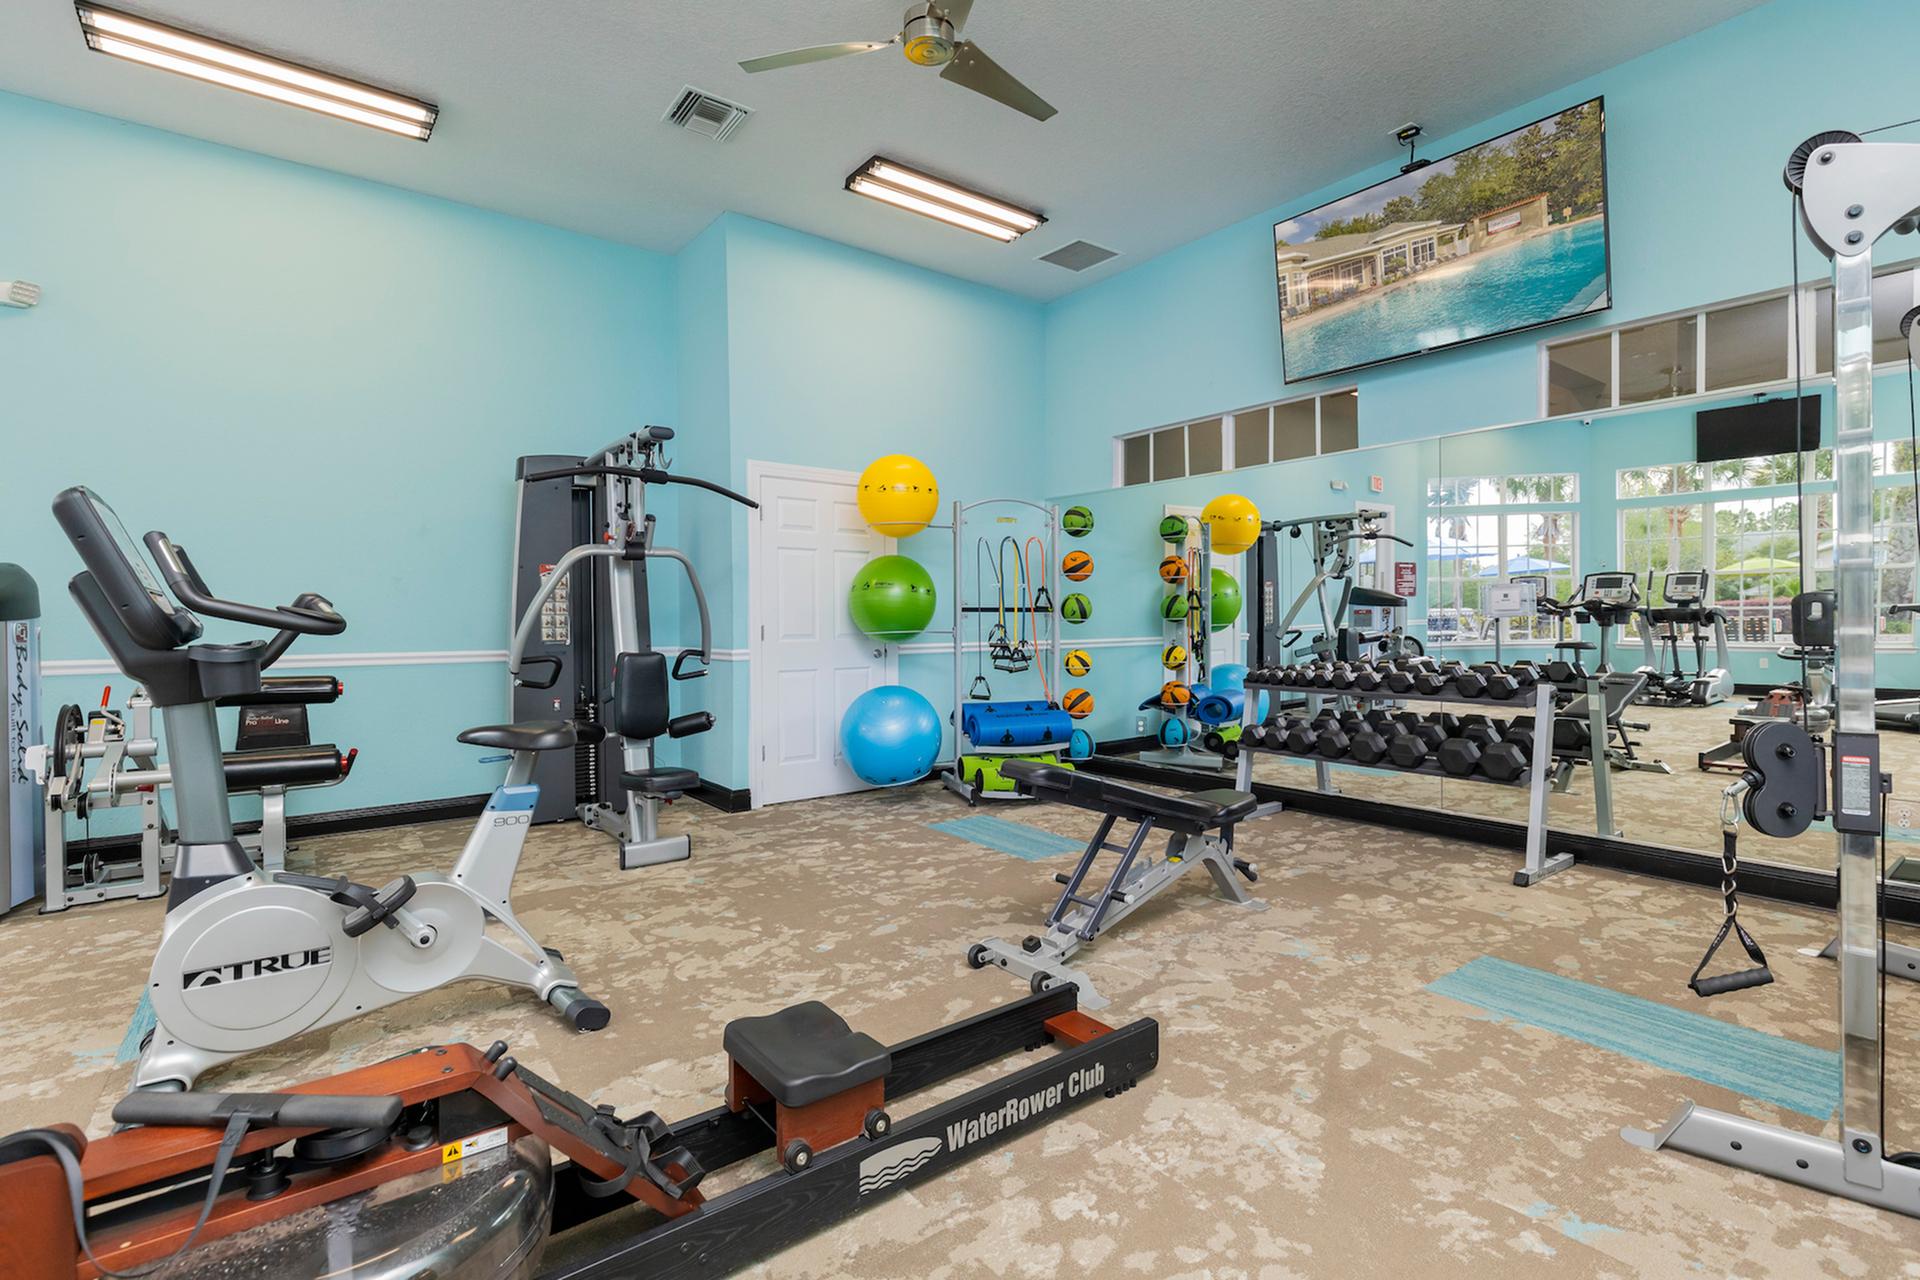 Highlands at Heathbrook Interior | 24-hour fitness center